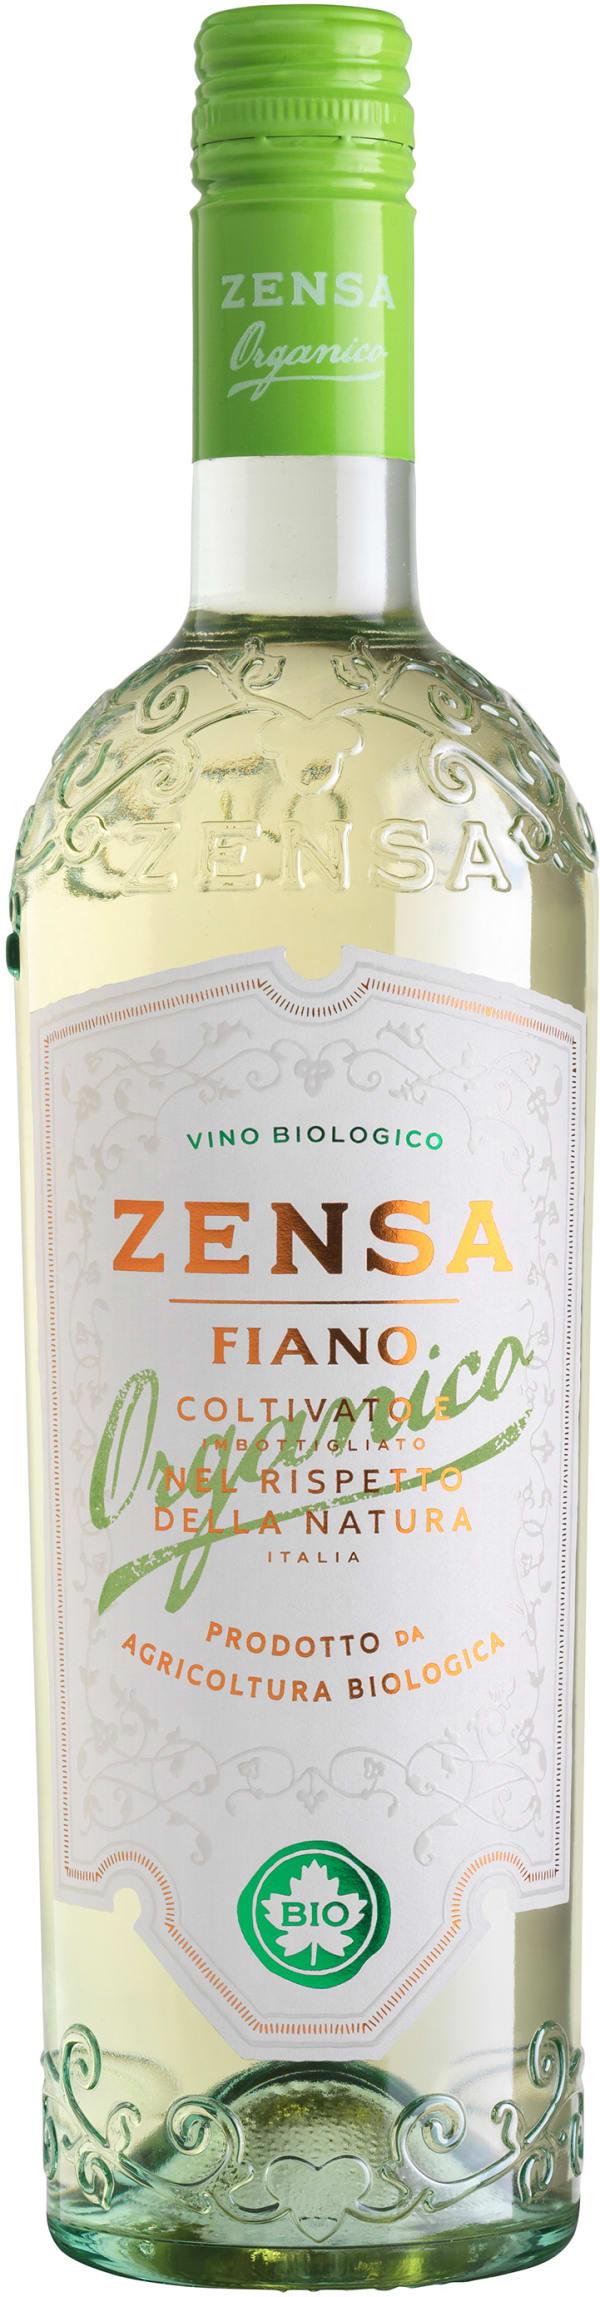 Zensa Fiano Organico 2017